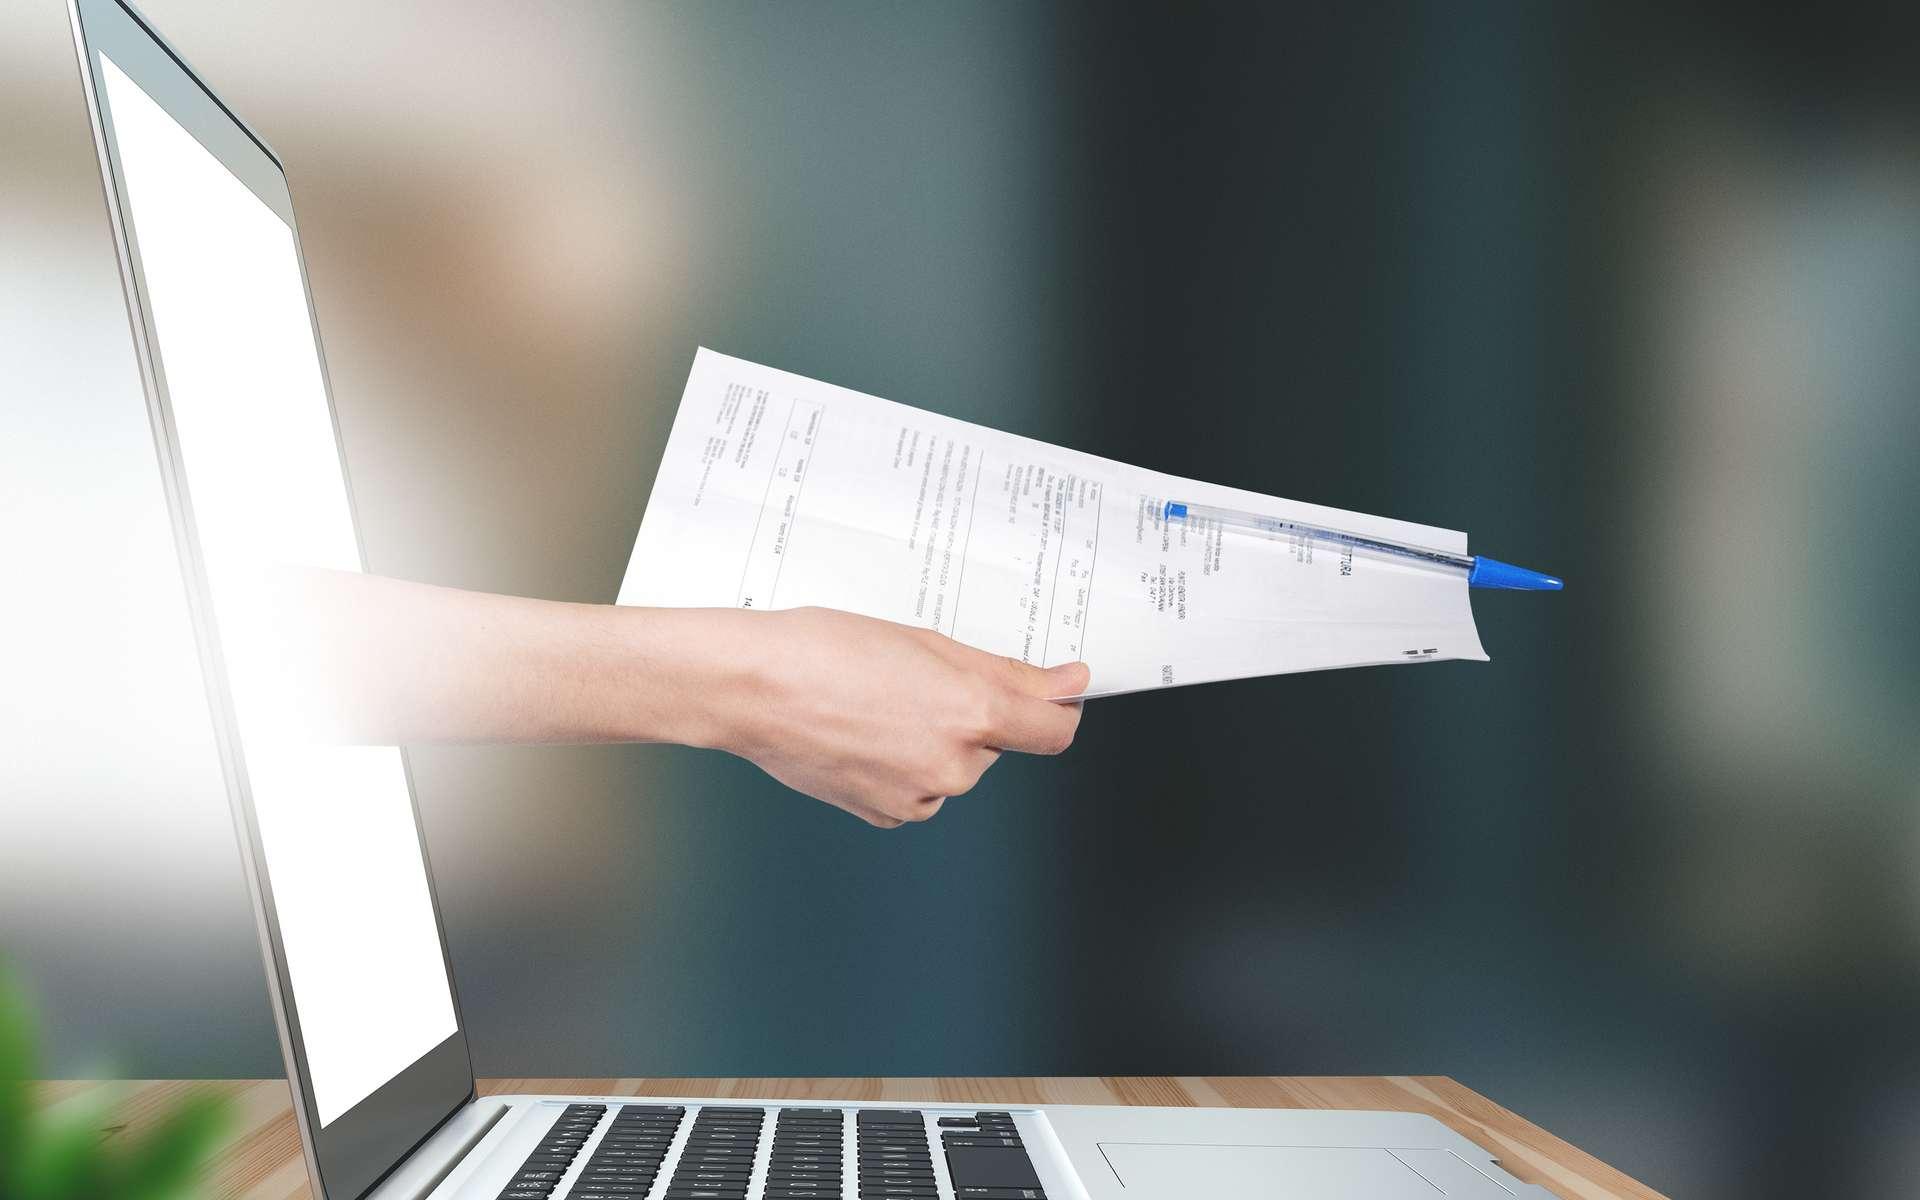 Aujourd'hui, la signature numérique possède la même valeur juridique qu'une signature manuscrite. © ALDECAstudio, Adobe Stock